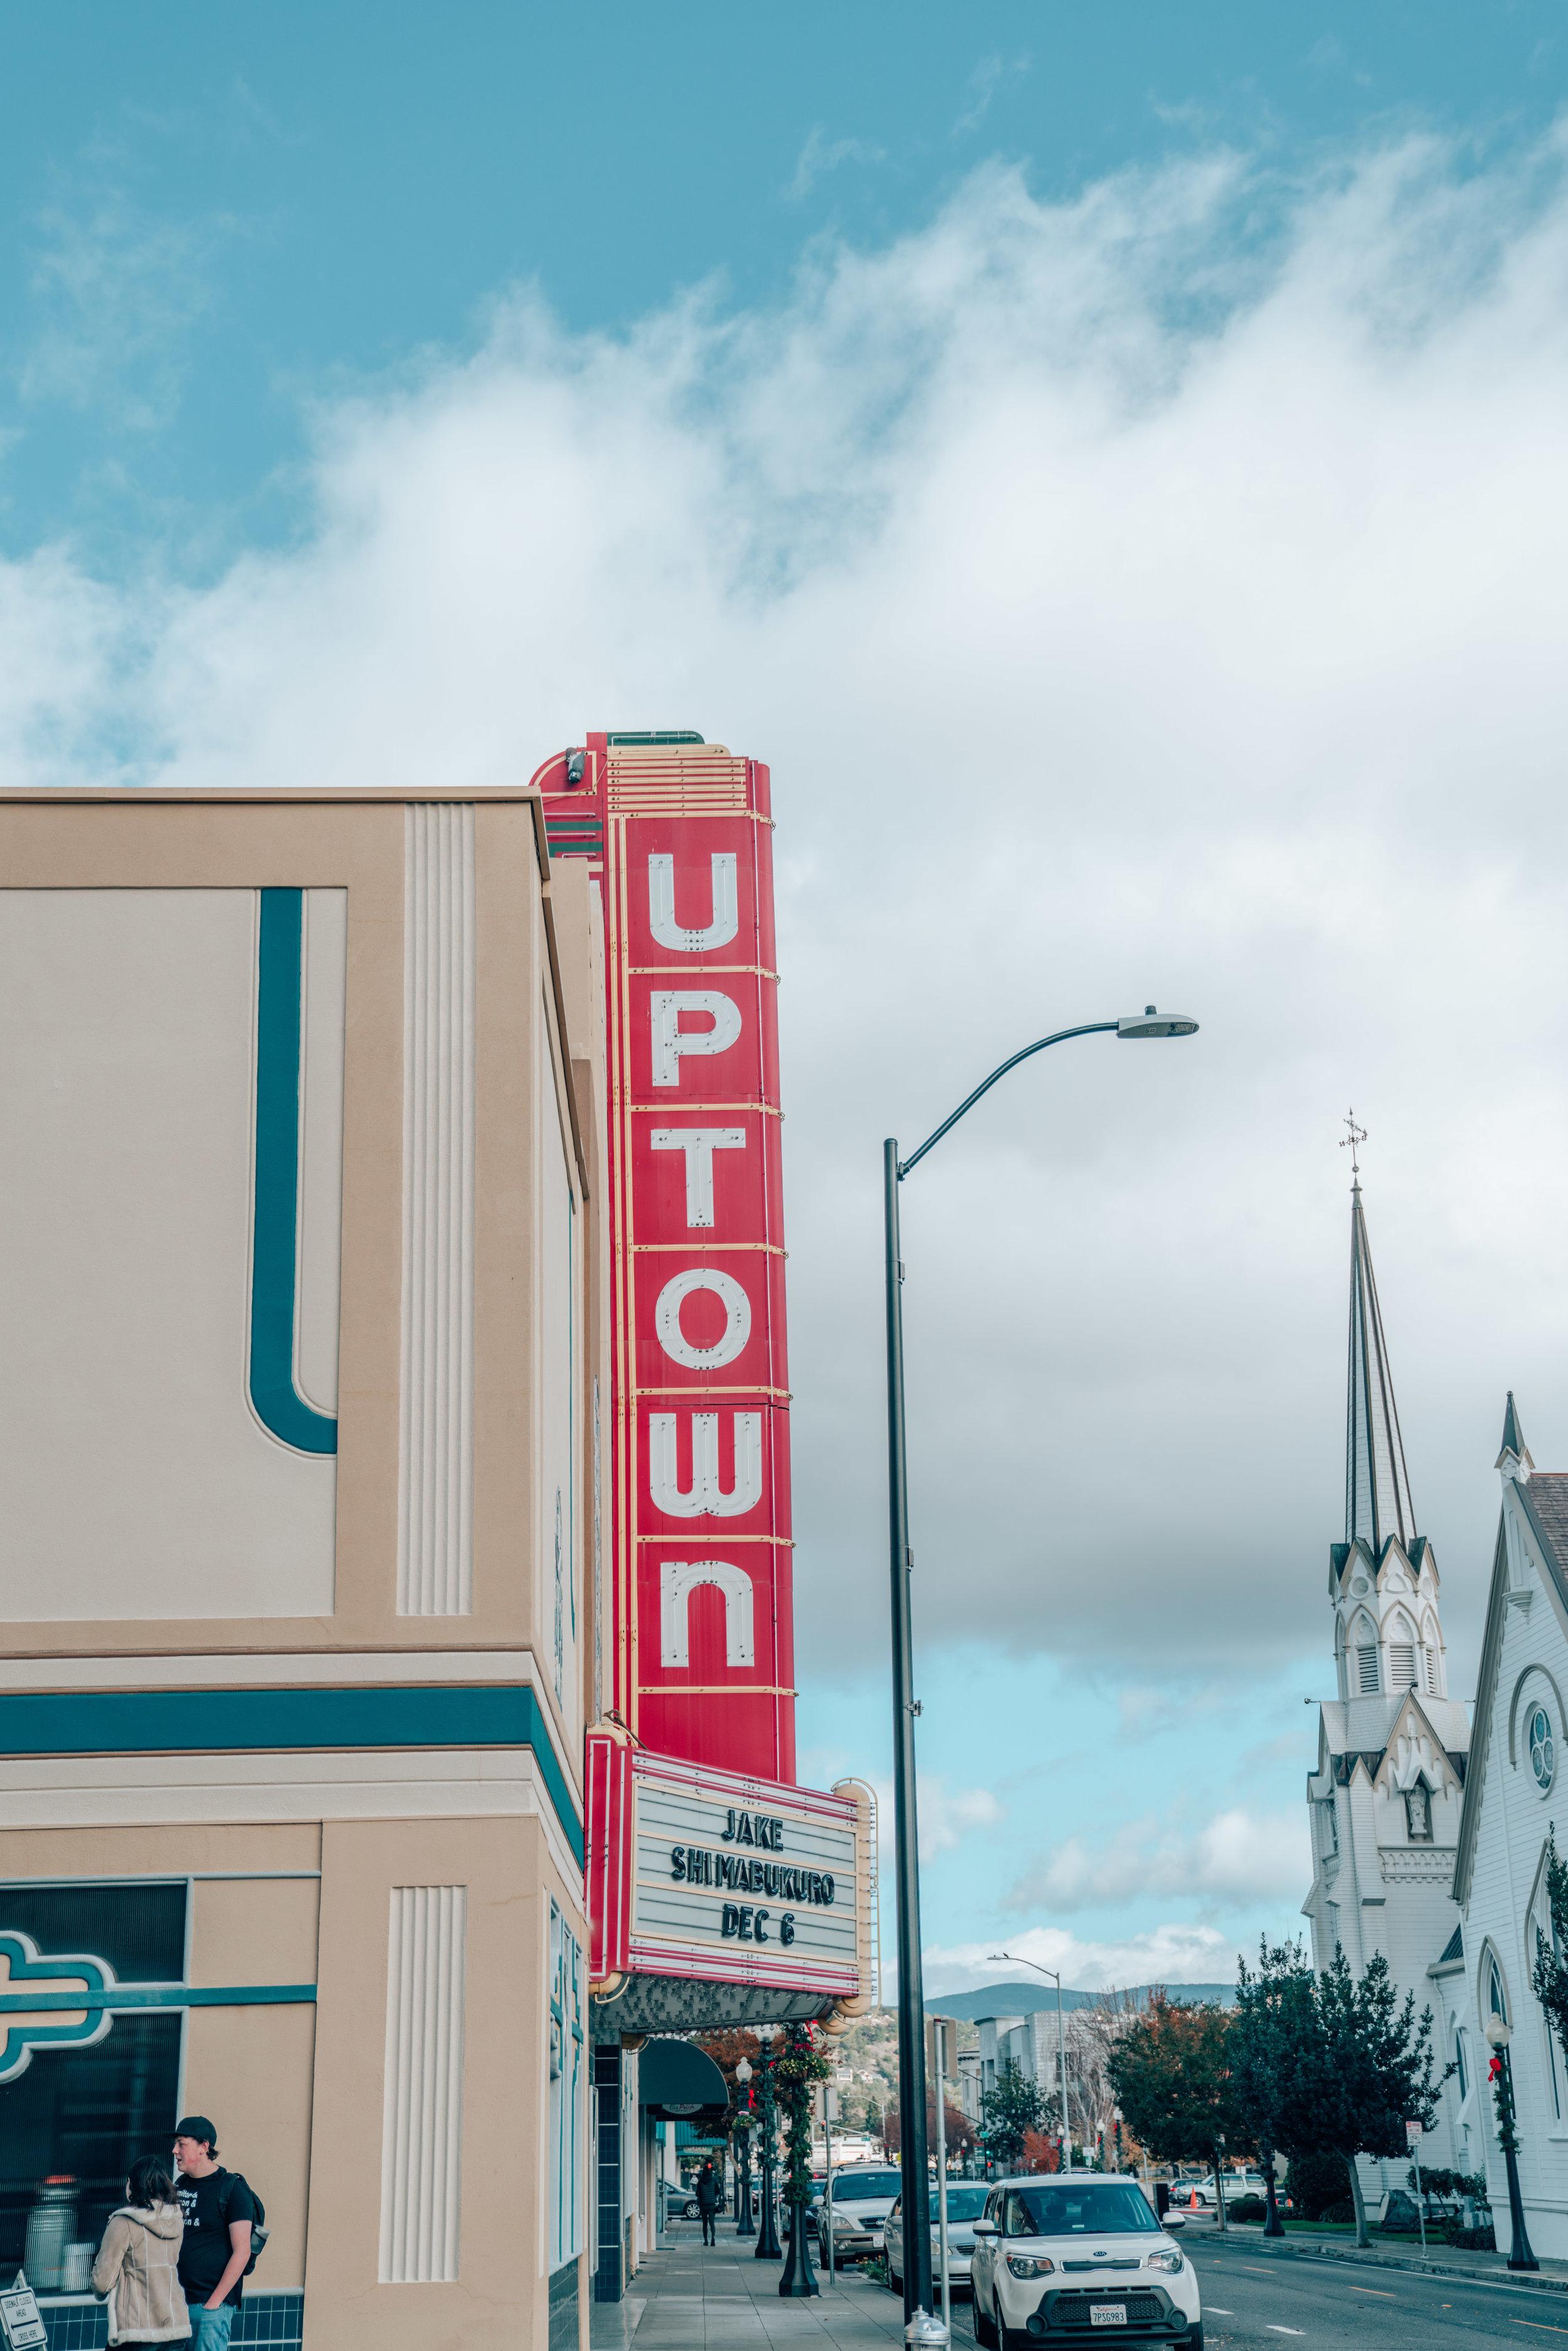 uptown theater.jpg